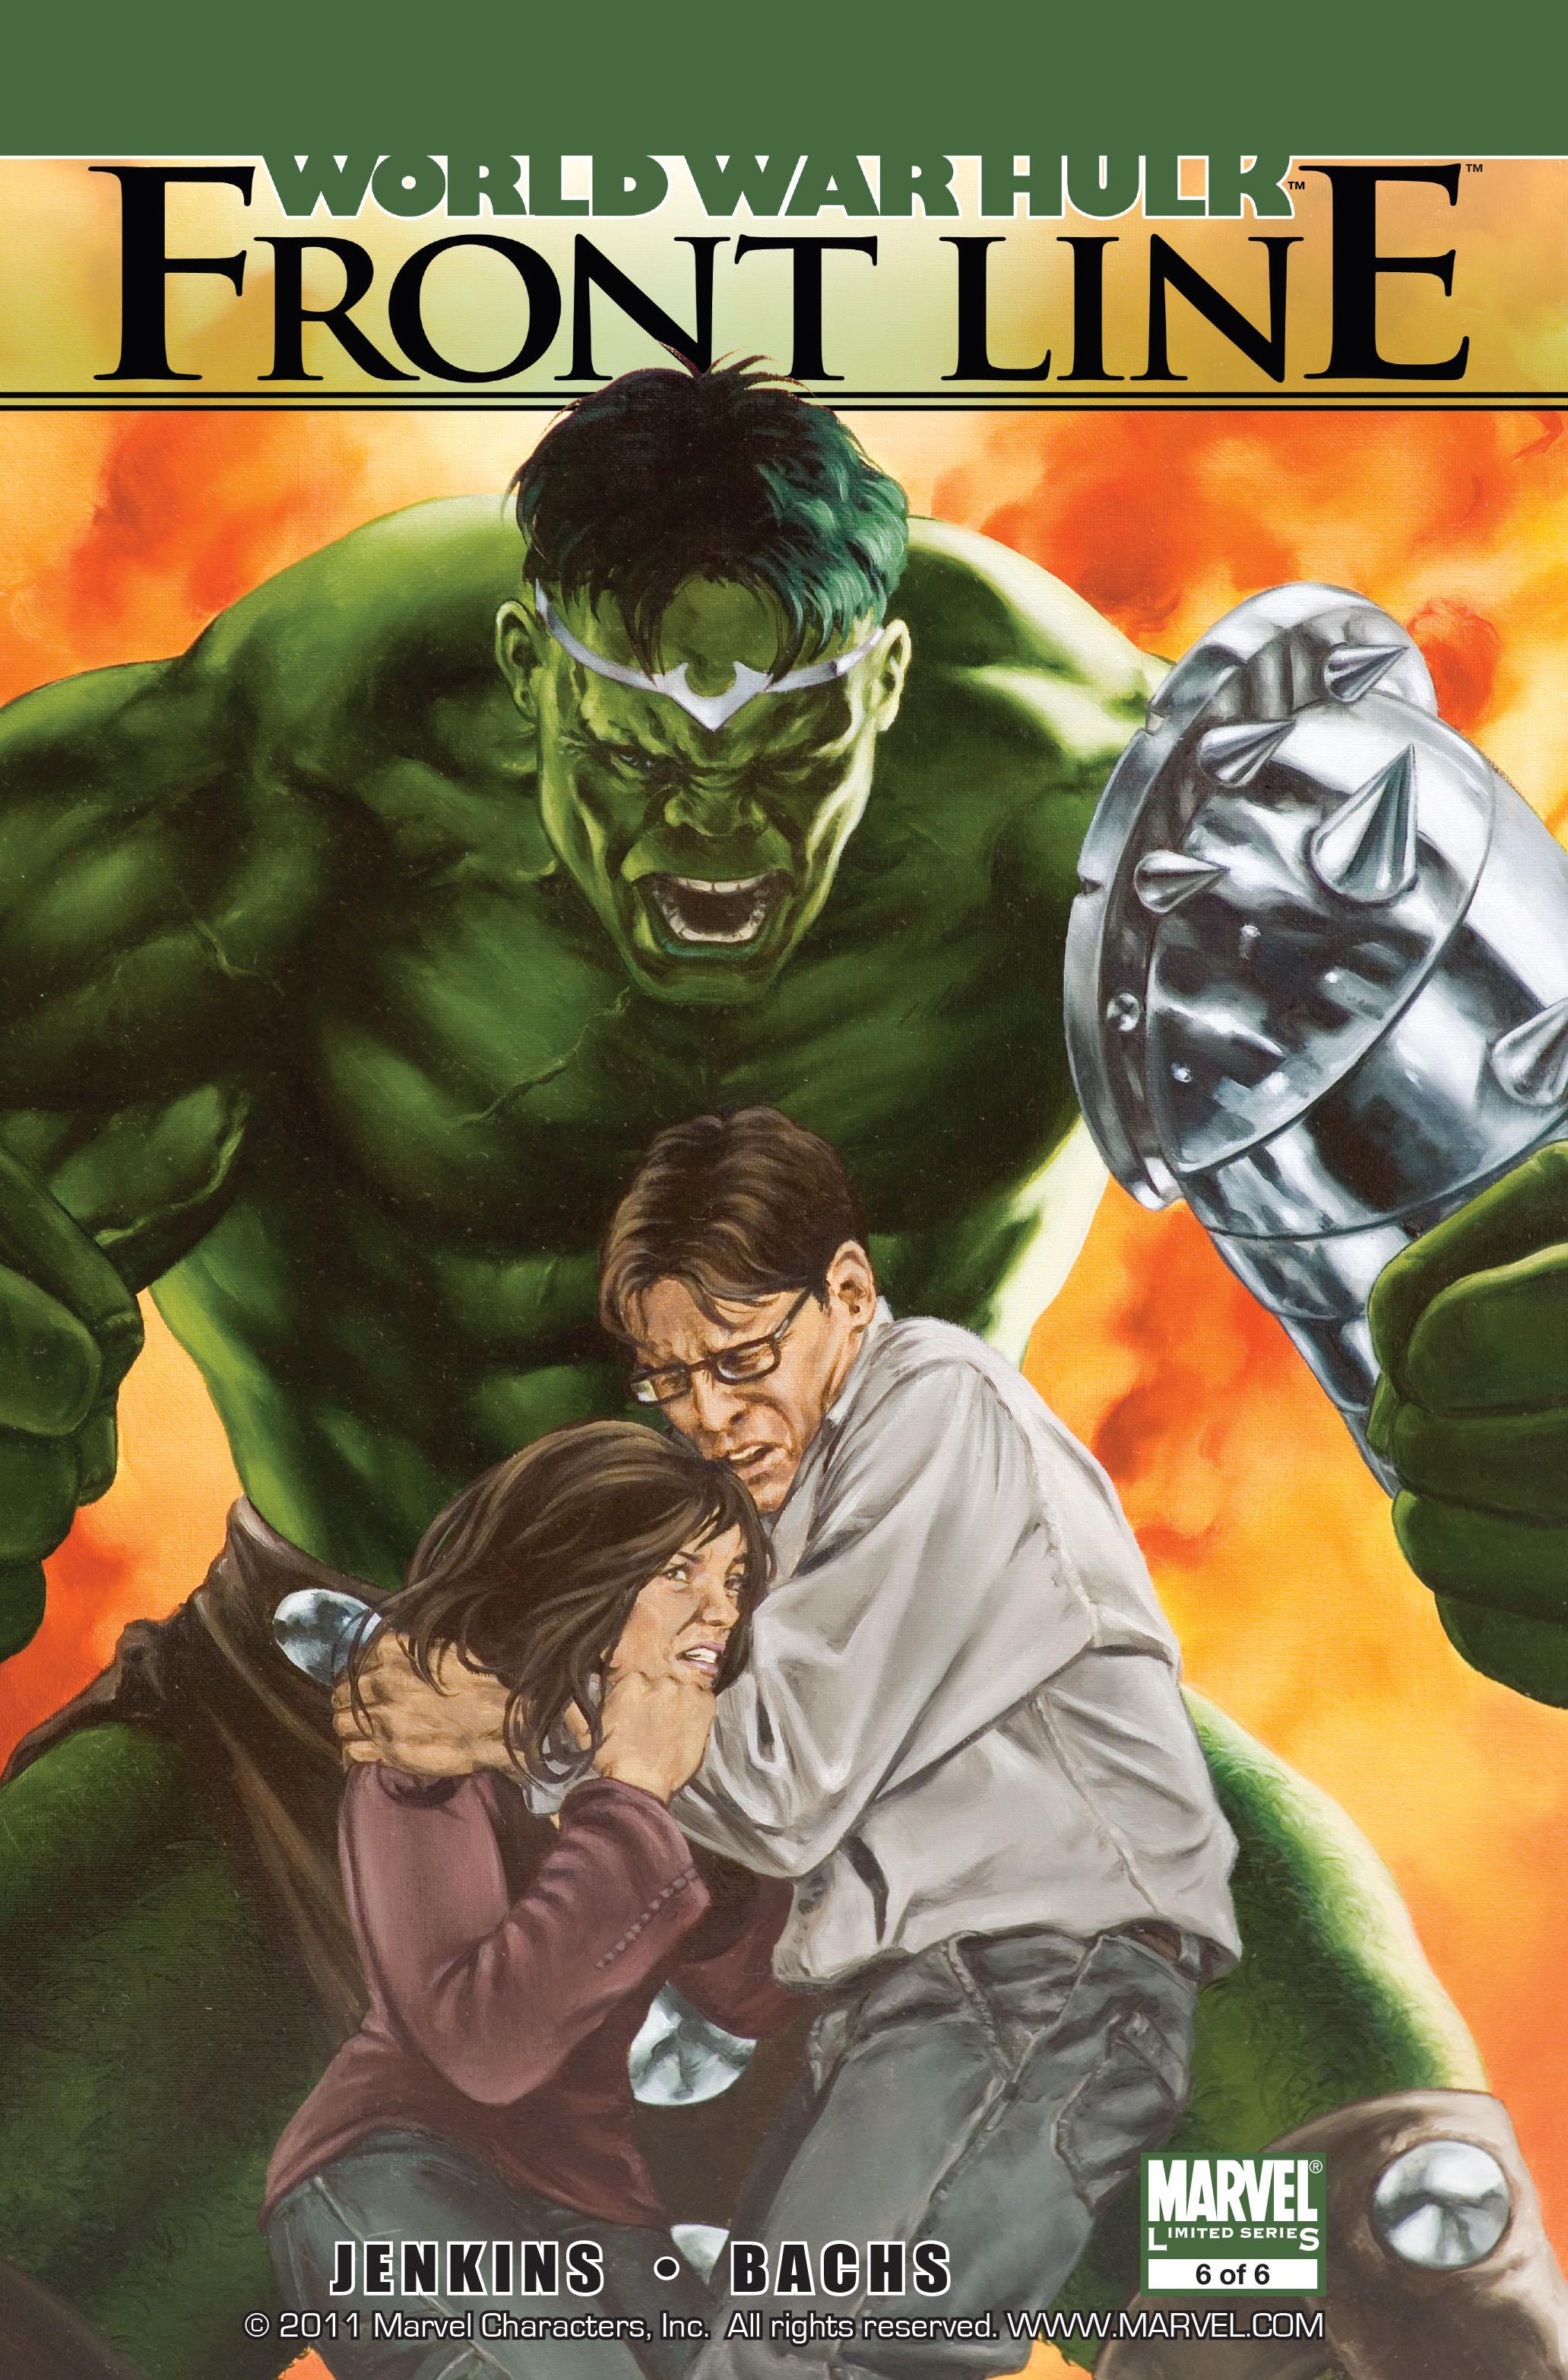 Read online World War Hulk: Front Line comic -  Issue #6 - 1